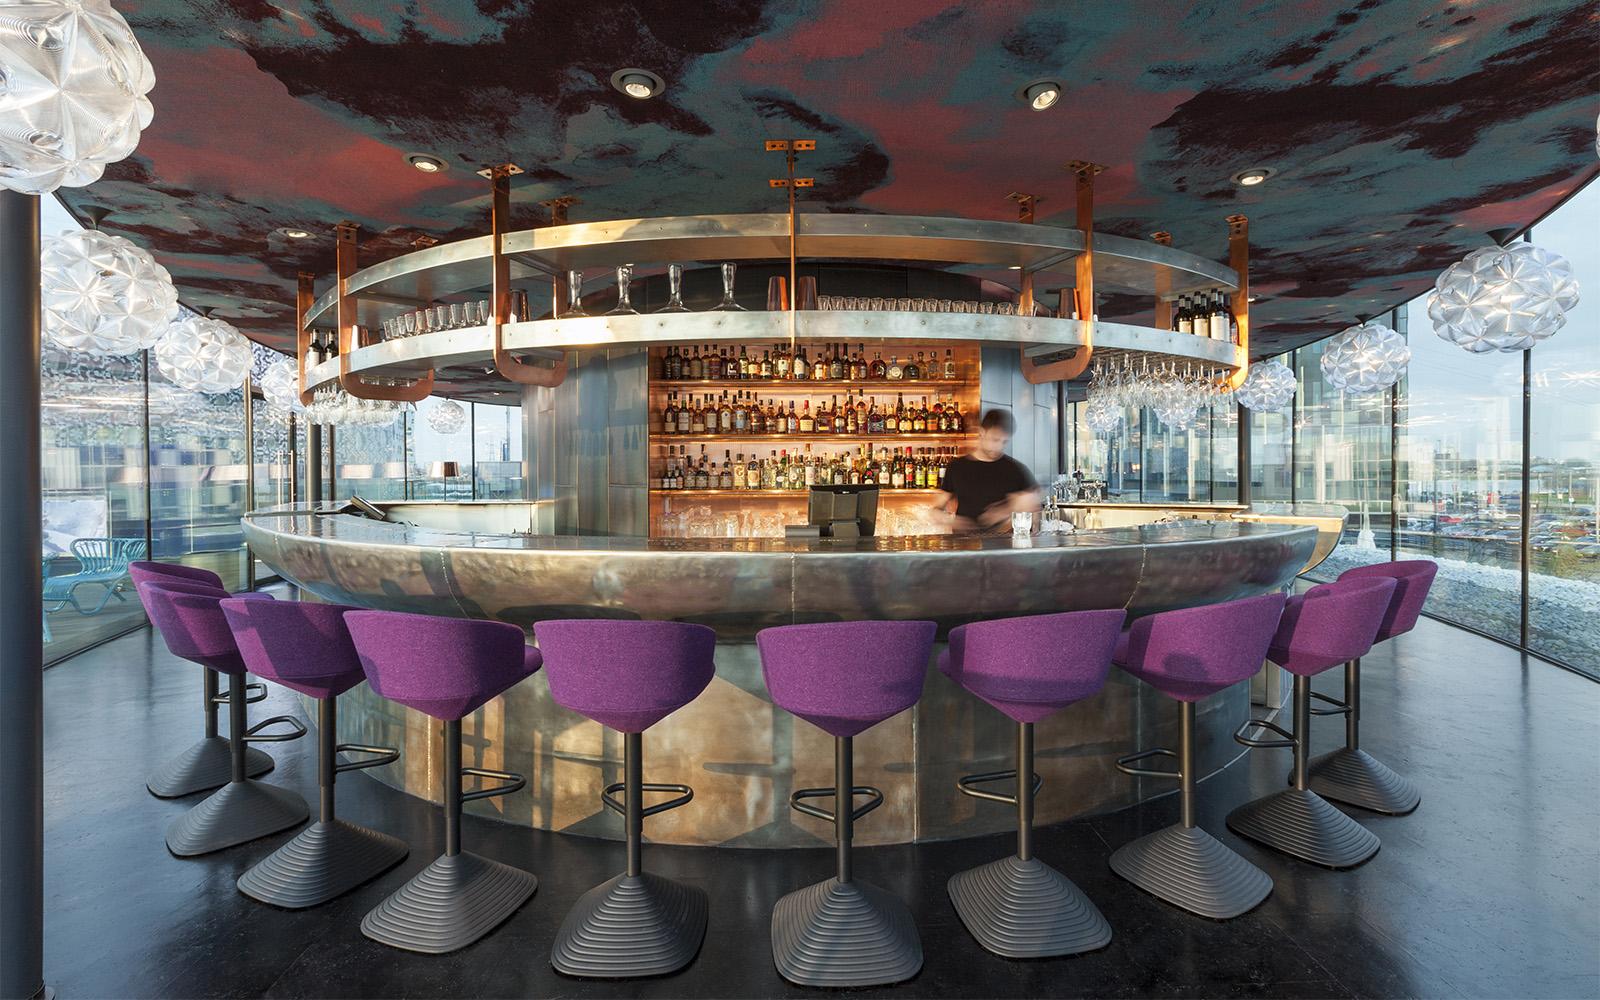 Craft London - a popular cocktail bar